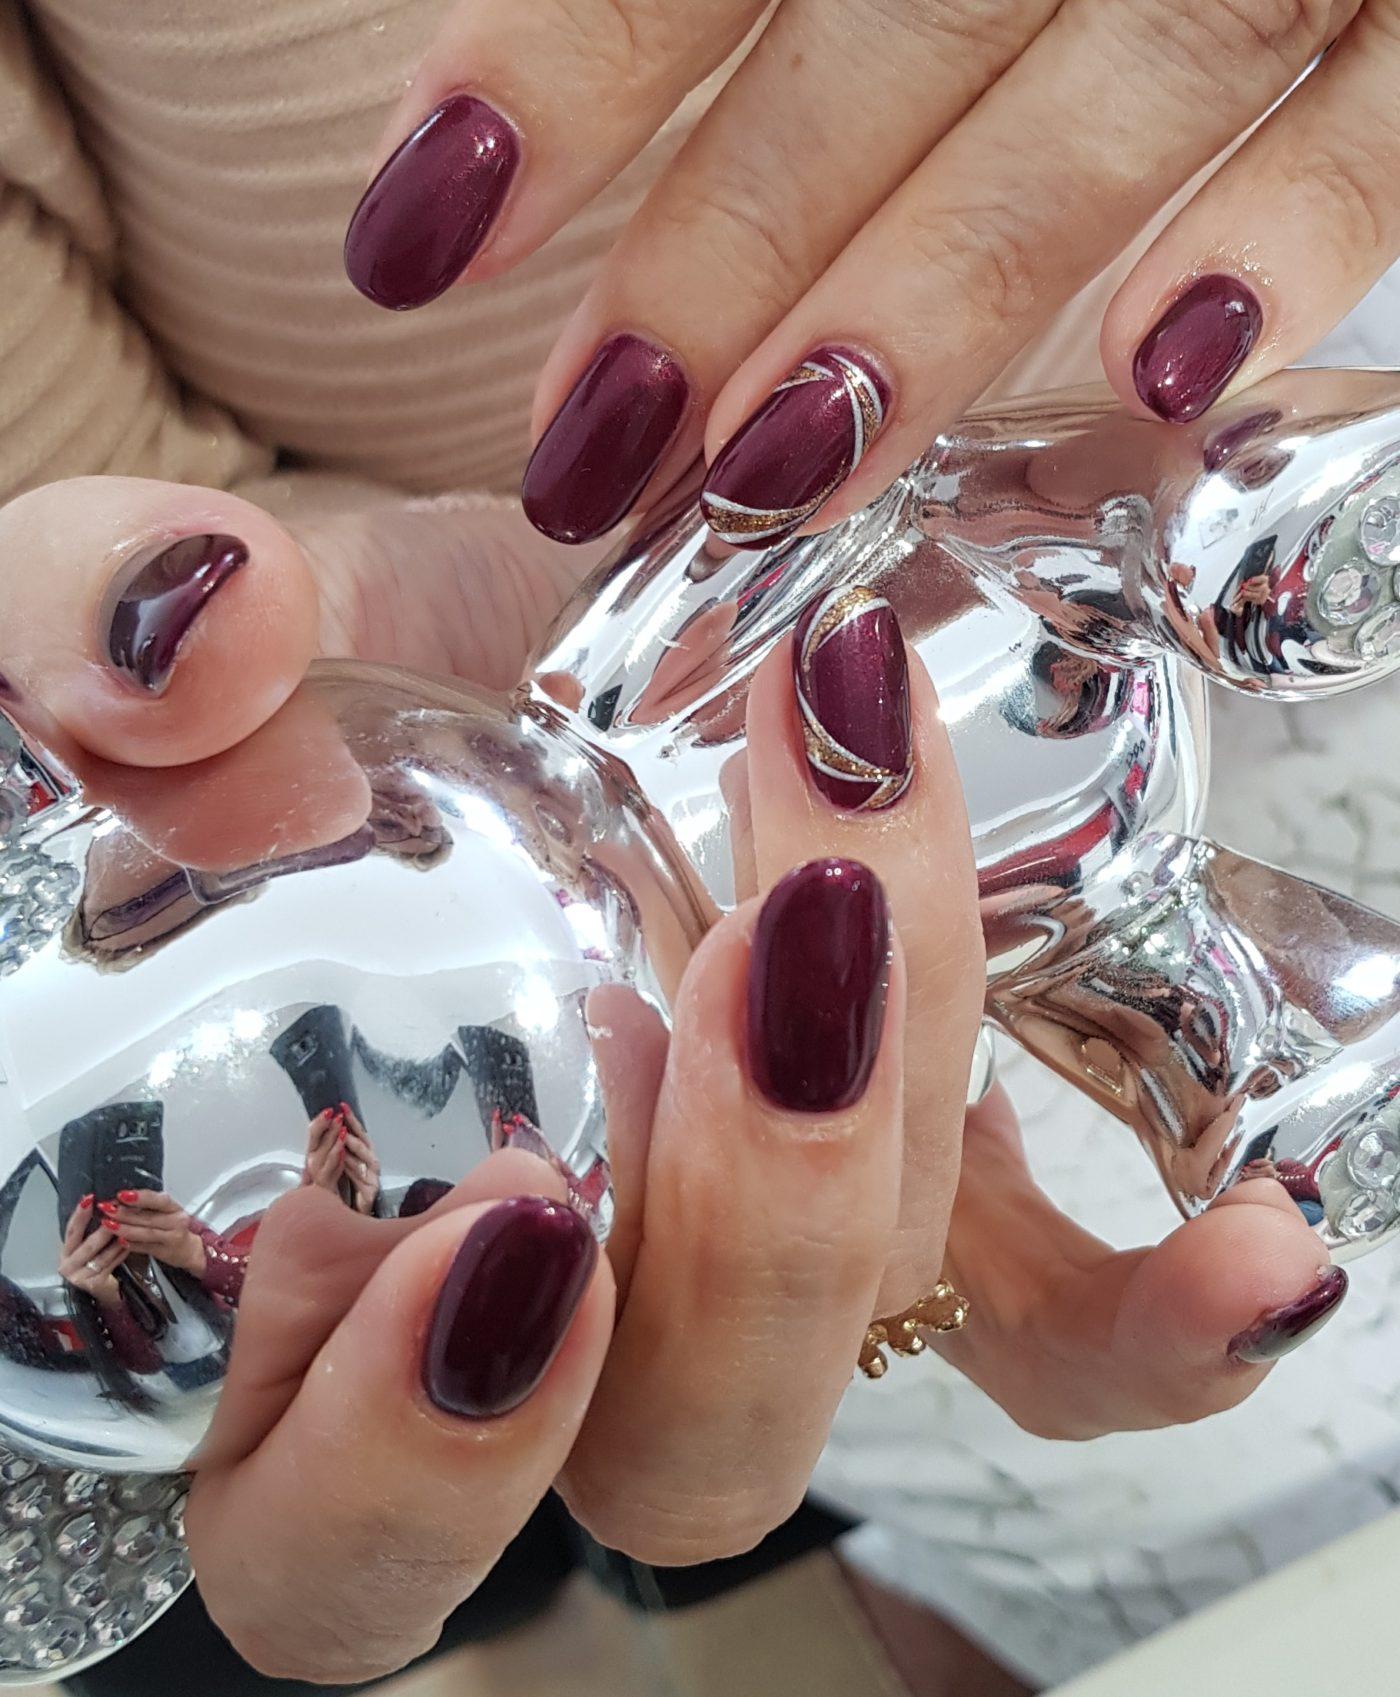 Pose-ongles-nail-art-neuville-sur-saone-lyon-ongles magnolia